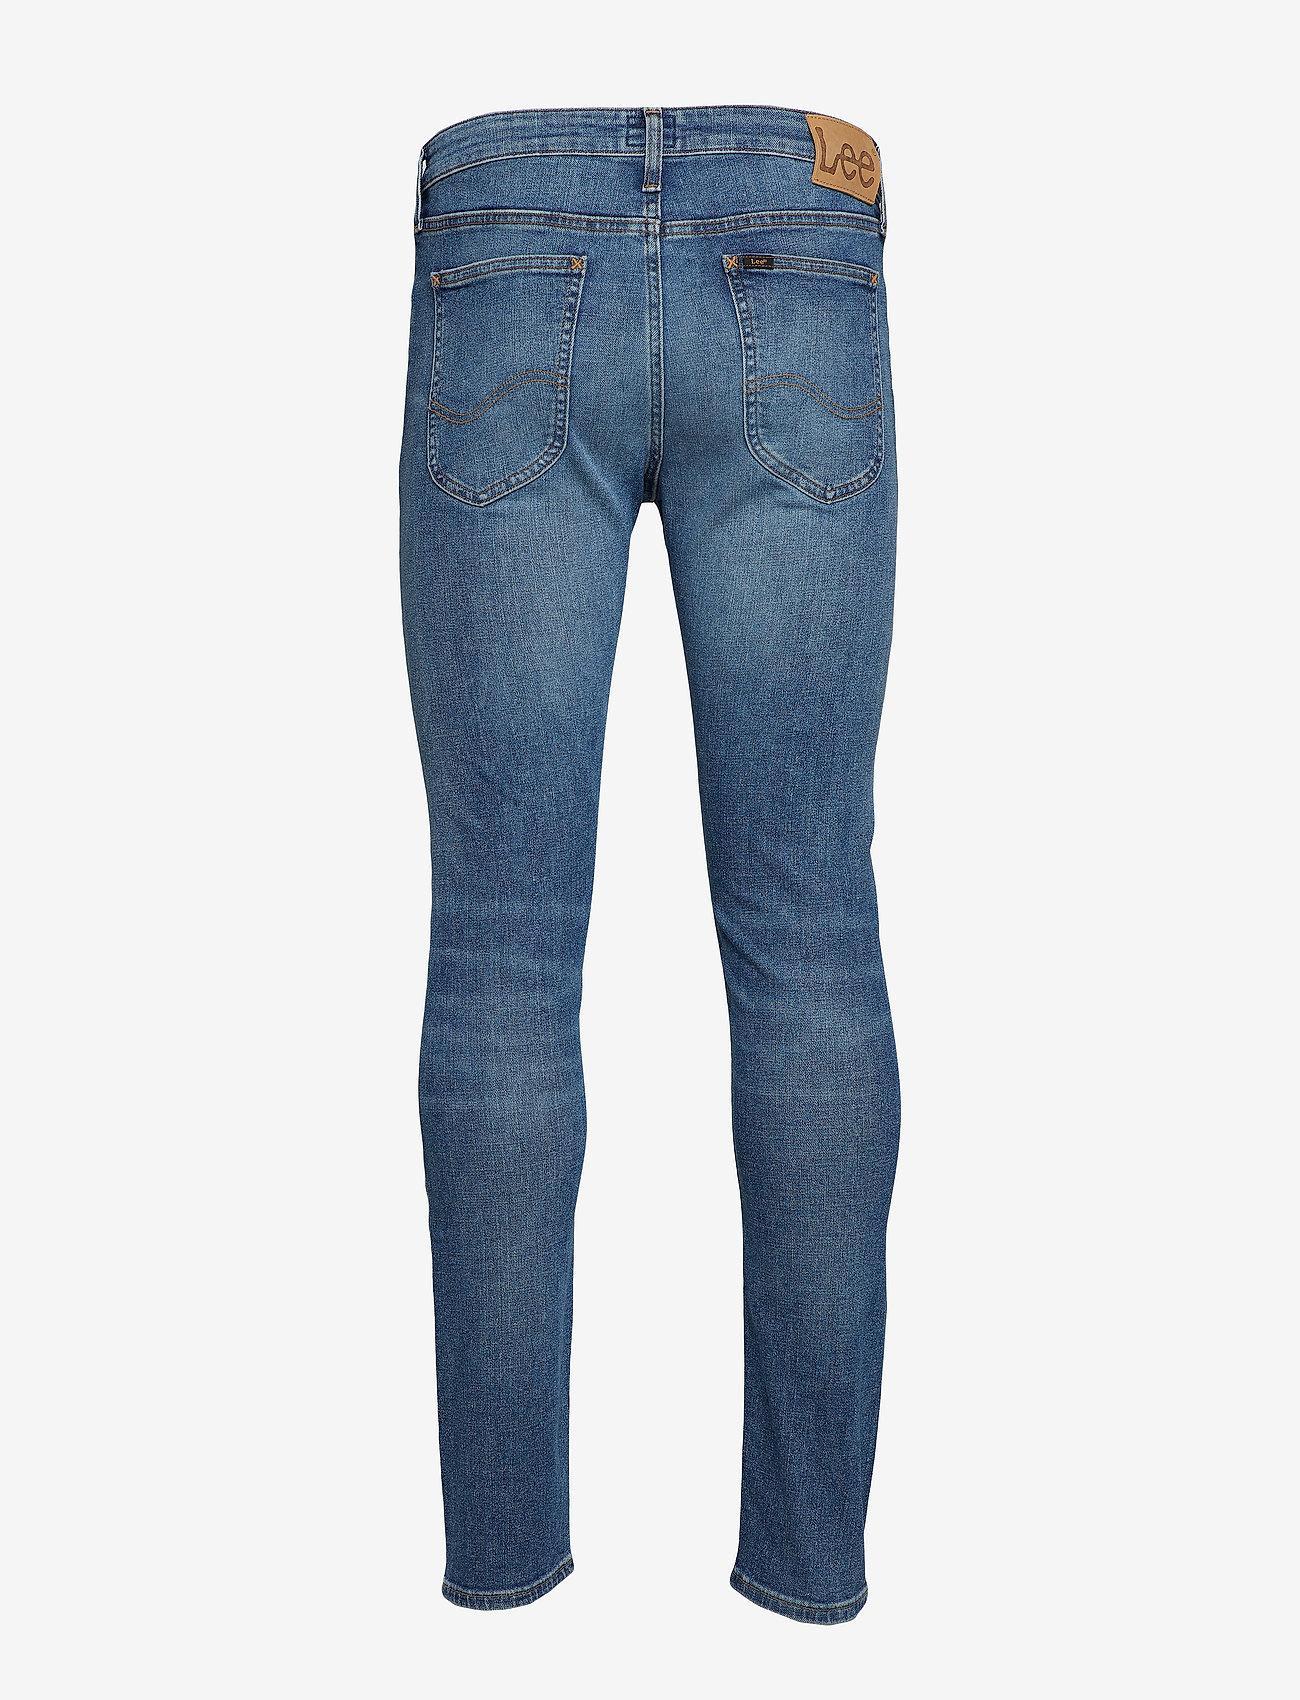 Malone (Vintage Large) - Lee Jeans qWW5hO